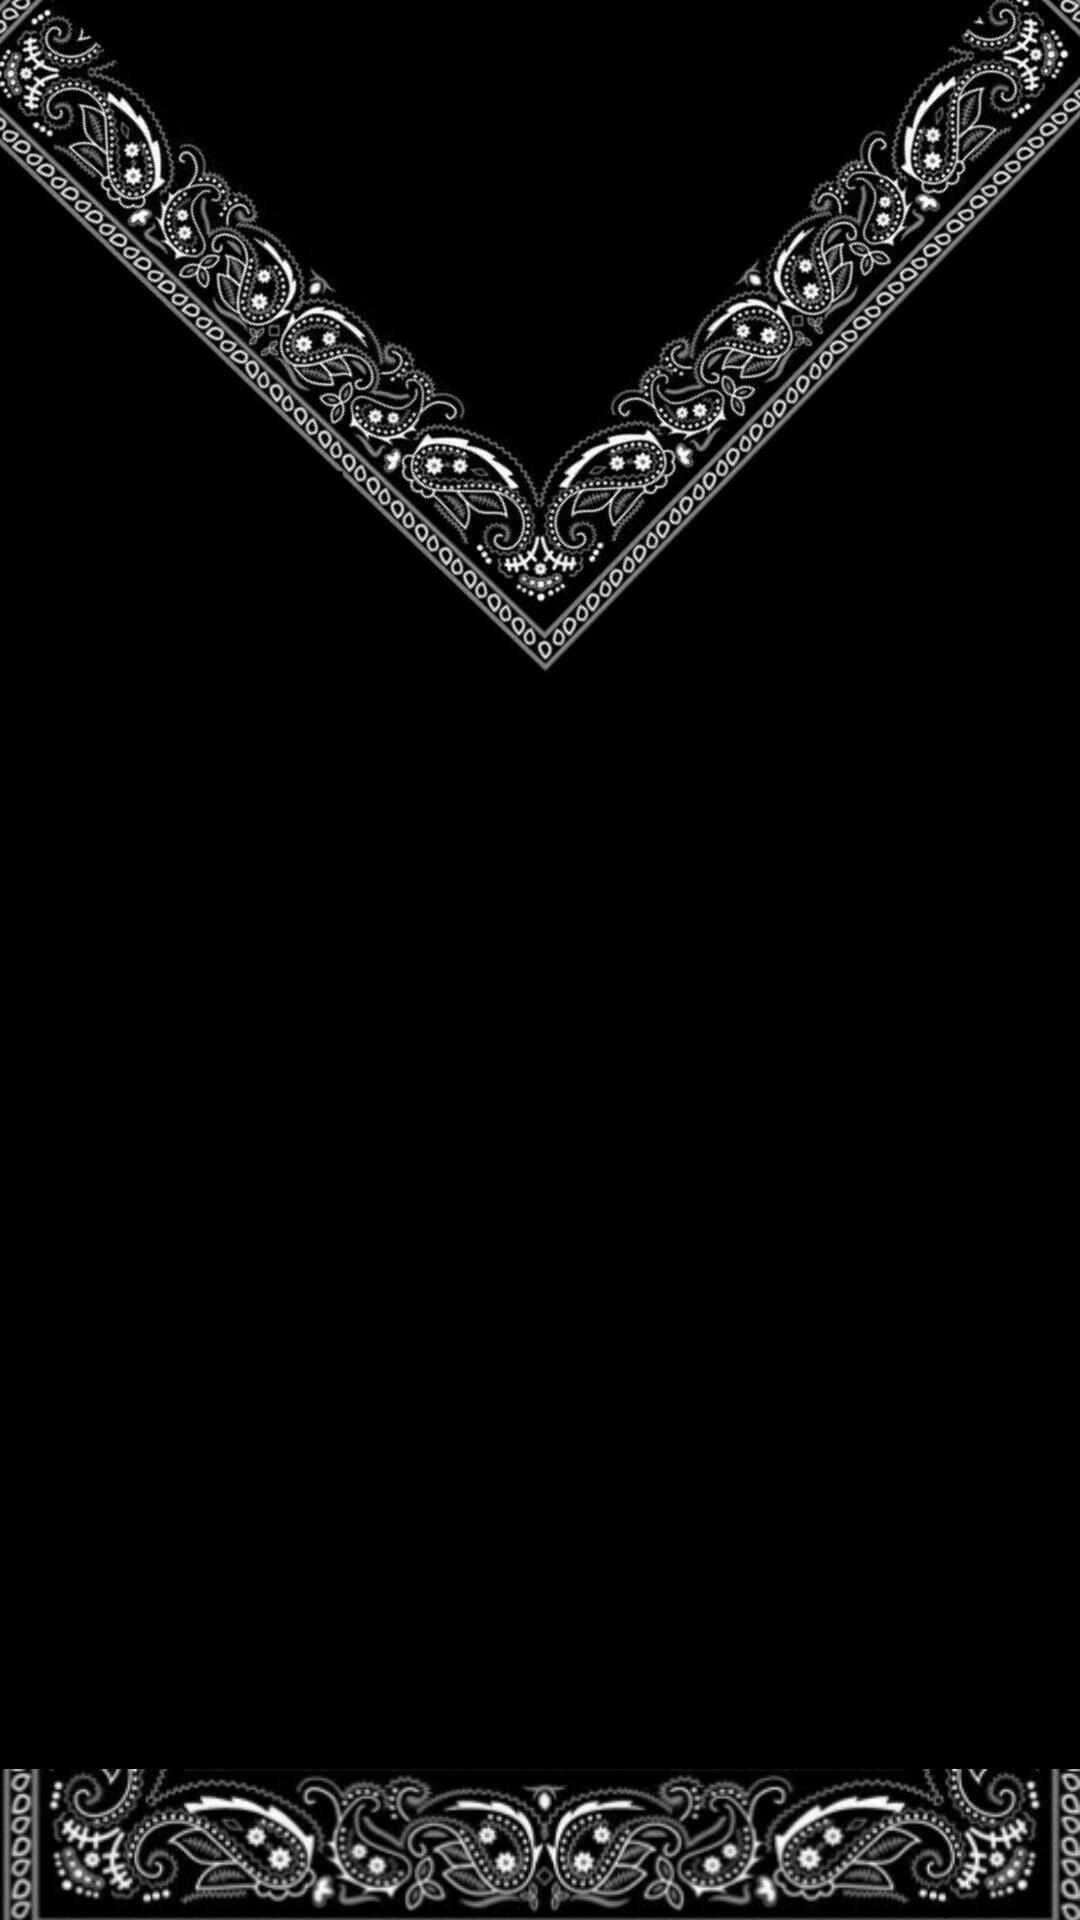 Black Bandana Wallpaper 46 images